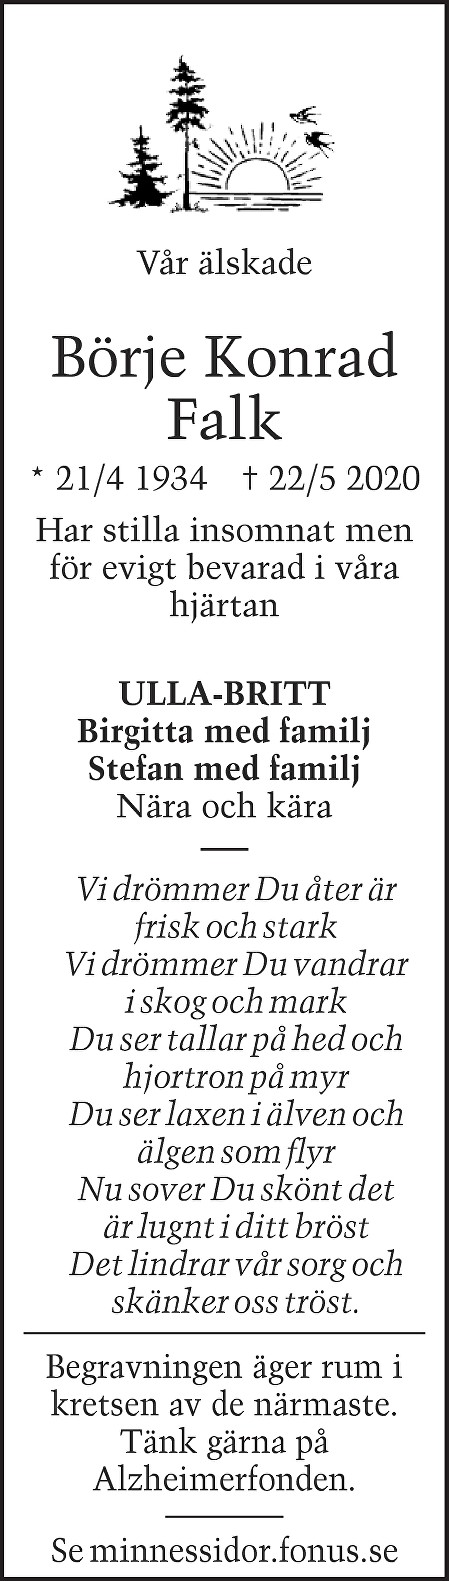 Börje Konrad Falk Death notice